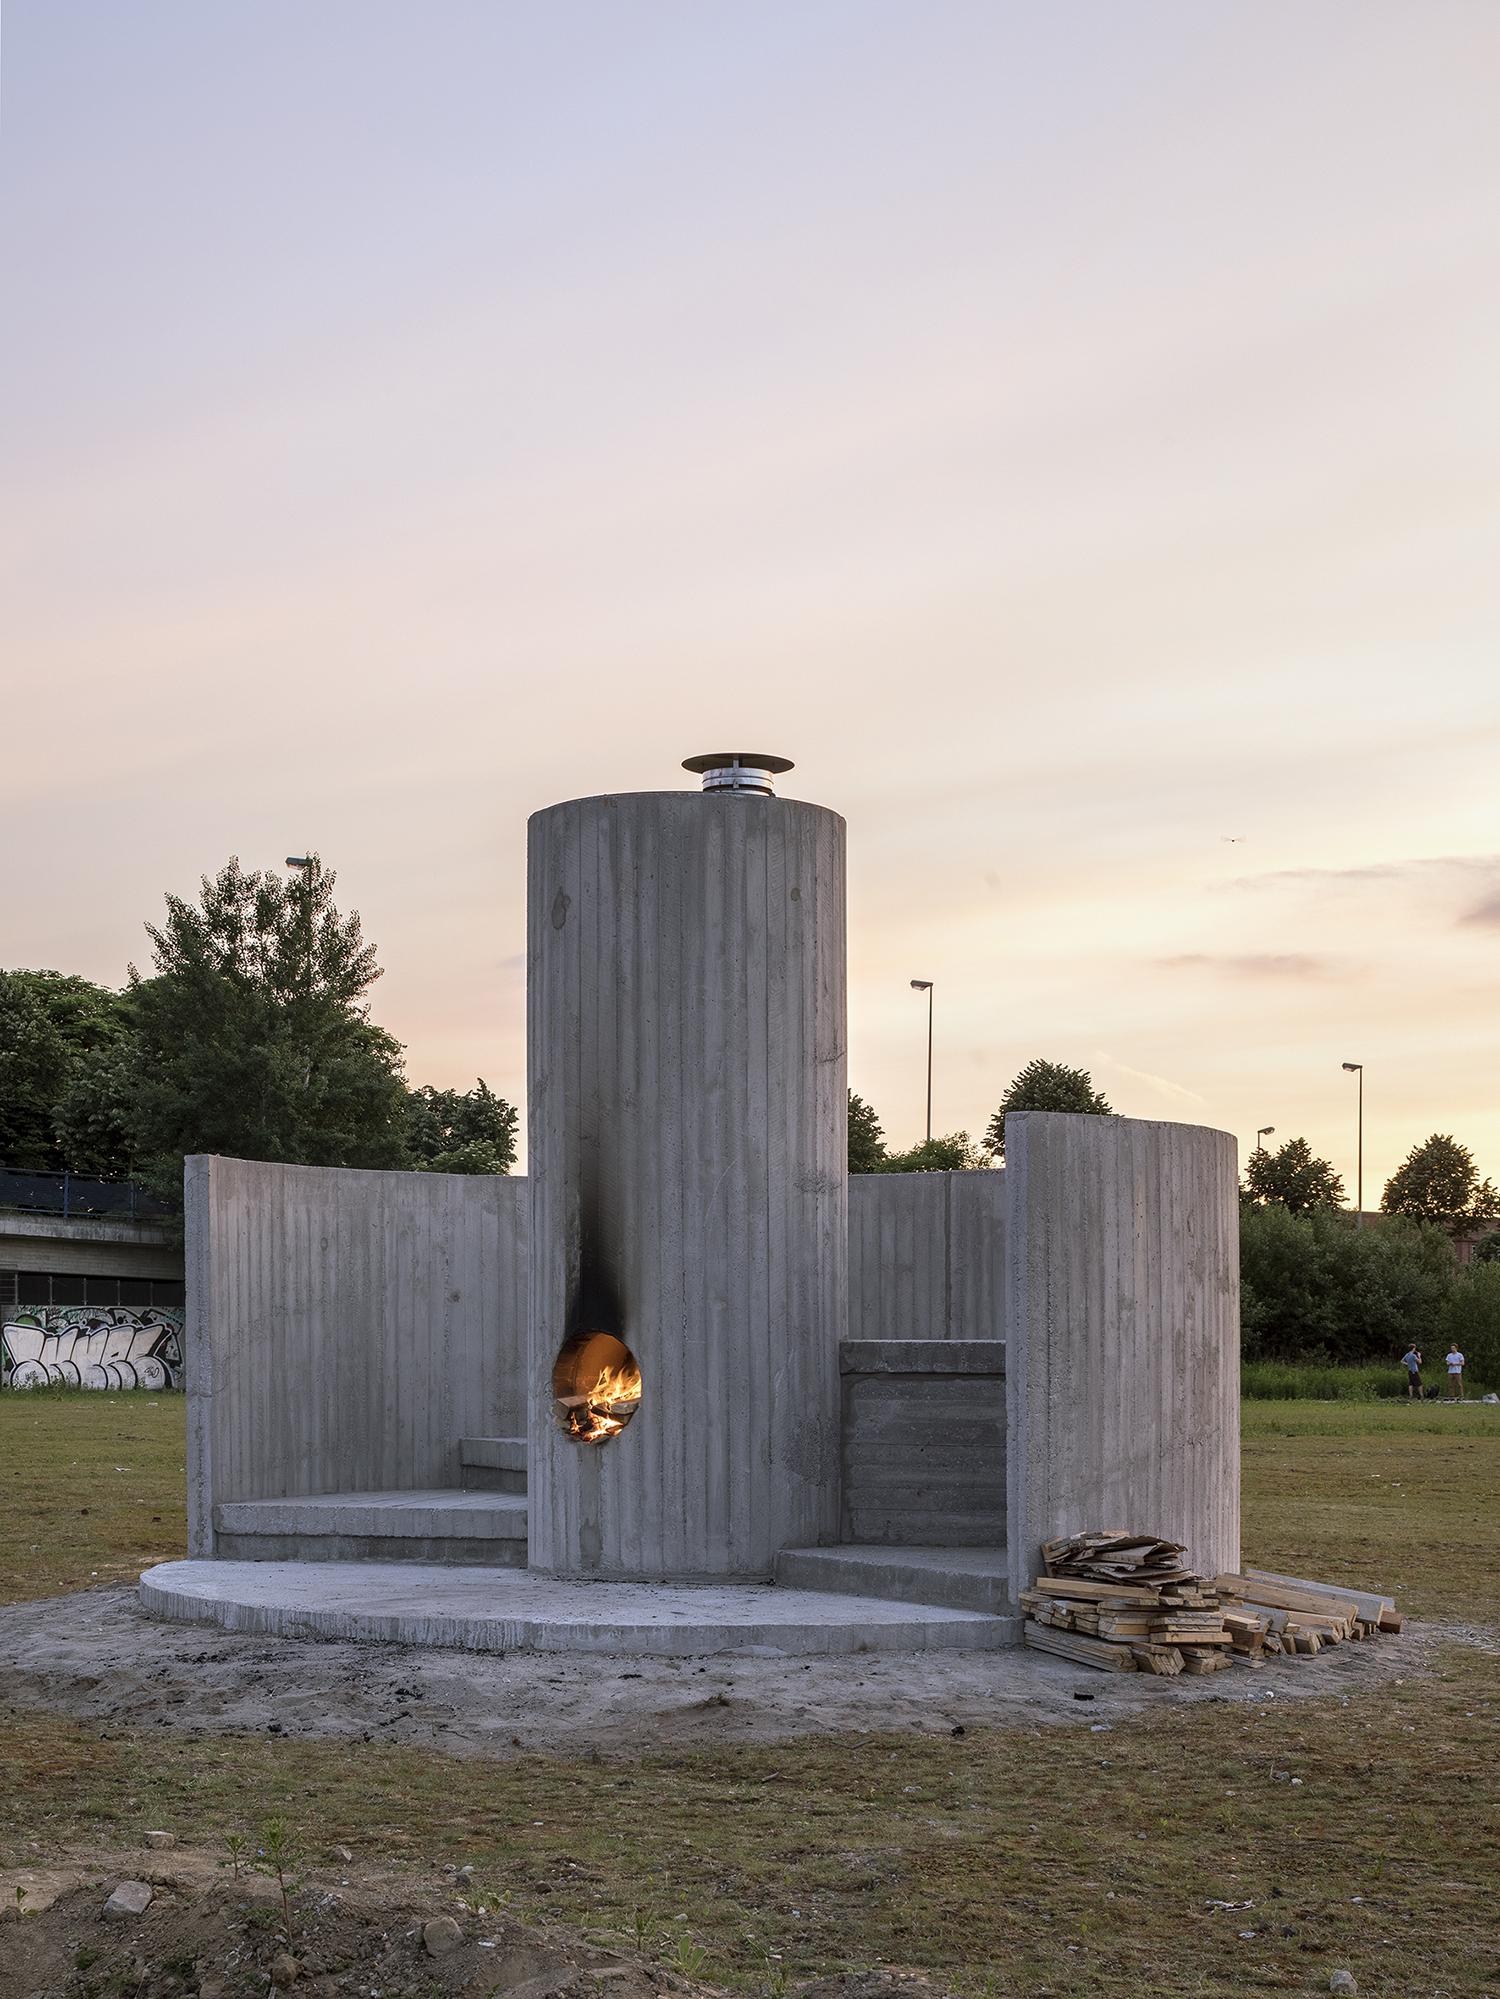 Oscar Tuazon, Burn the Formwork © Skulptur Projekte 2017. Photo: Henning Rogge.